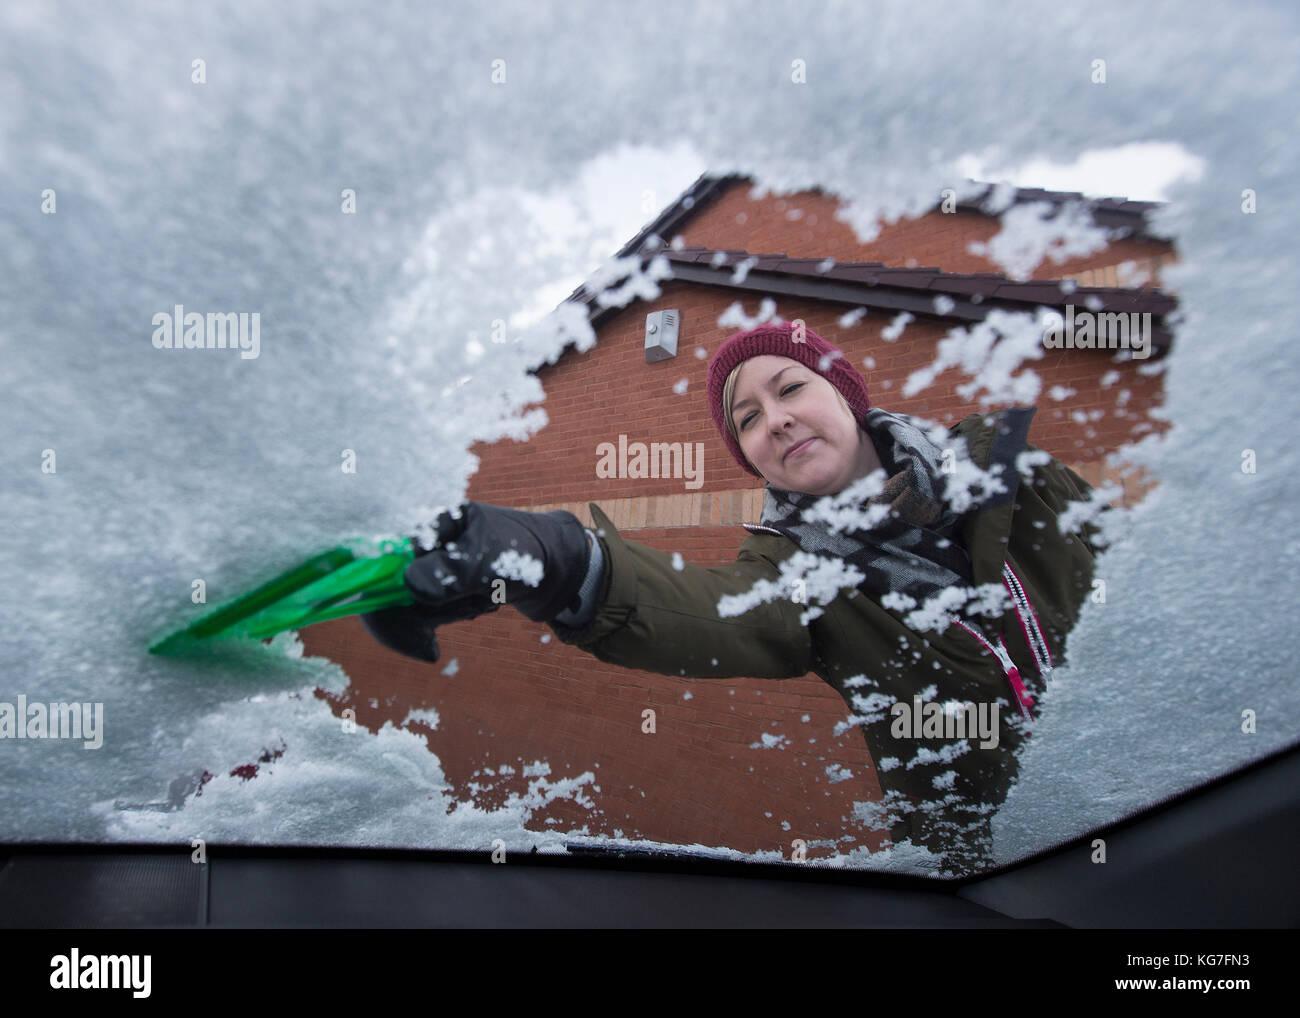 Mujer raspa hielo de car window Imagen De Stock